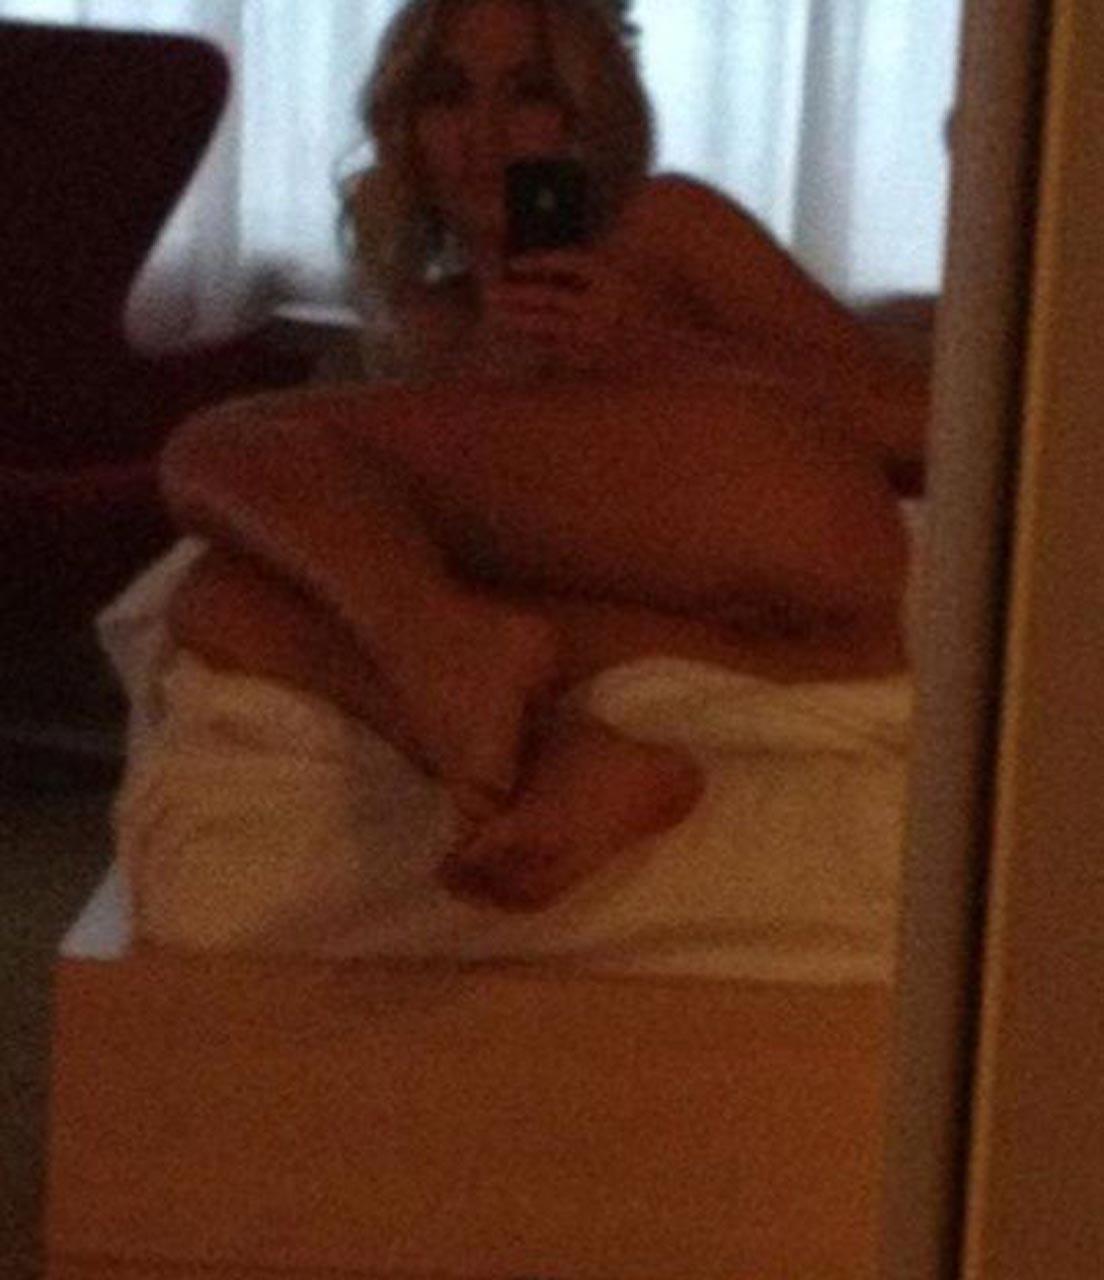 Porn Julia Kovalchuk nudes (33 photos), Pussy, Sideboobs, Feet, panties 2015